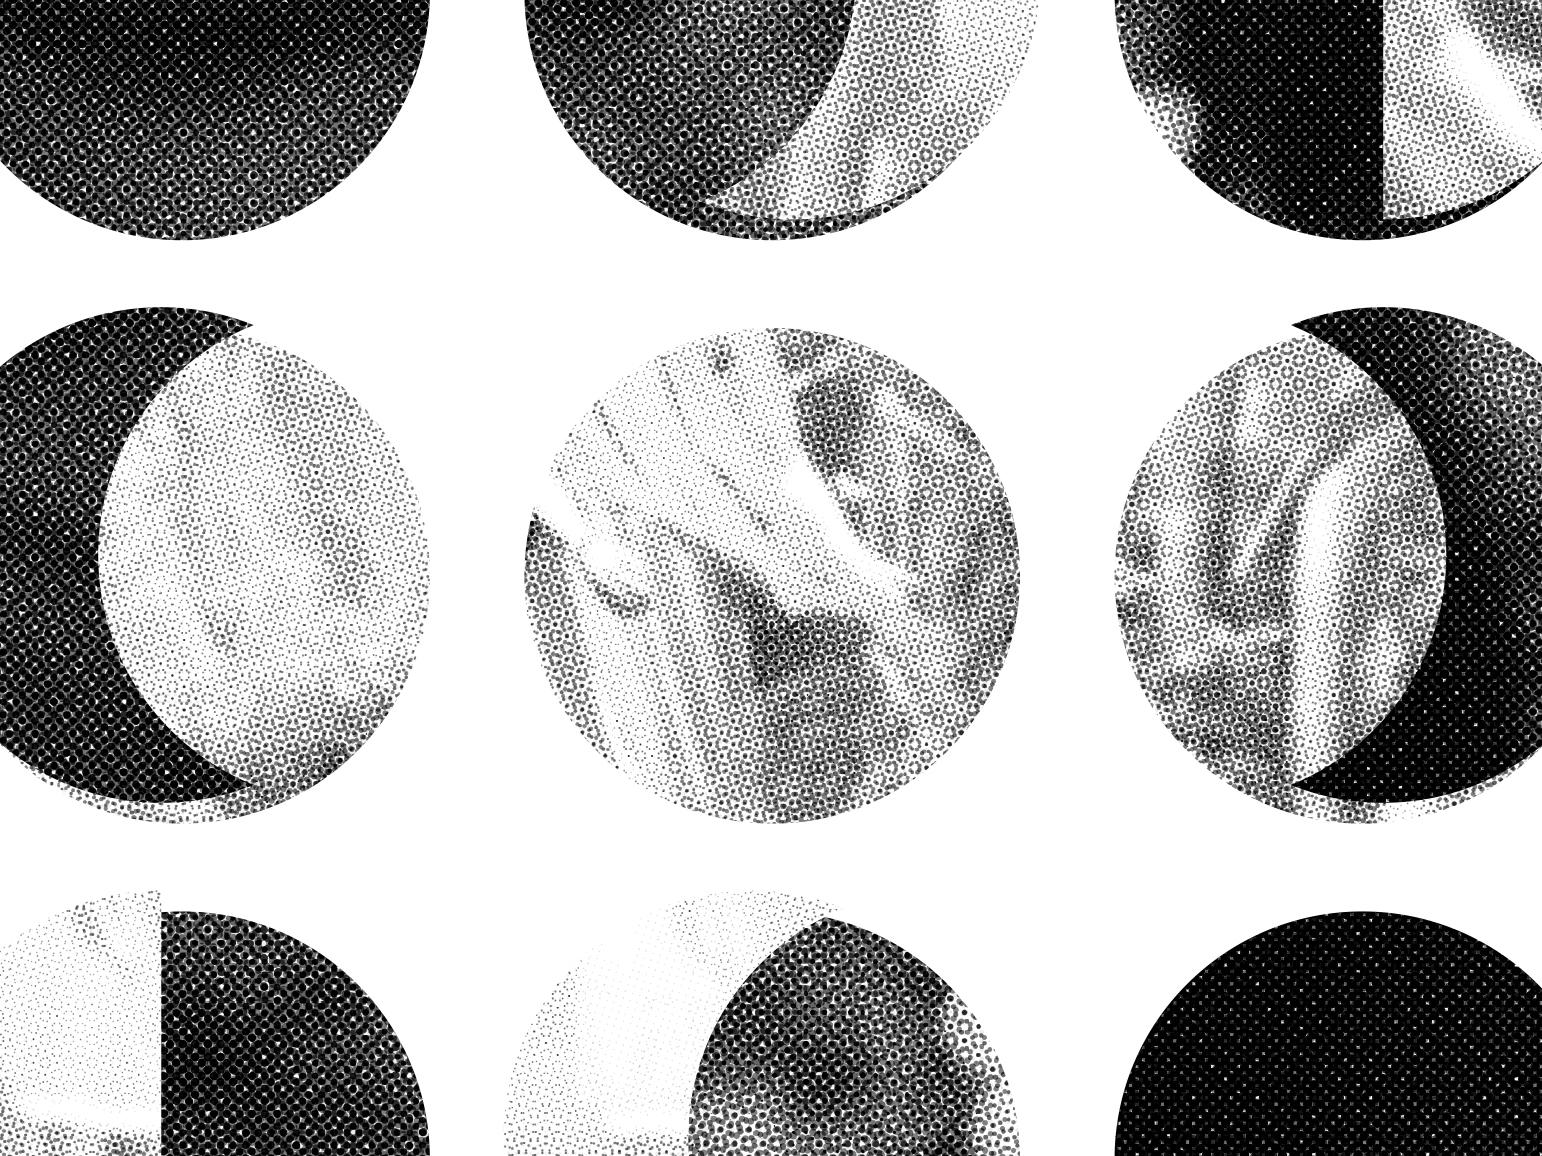 textureddots_detail.jpg